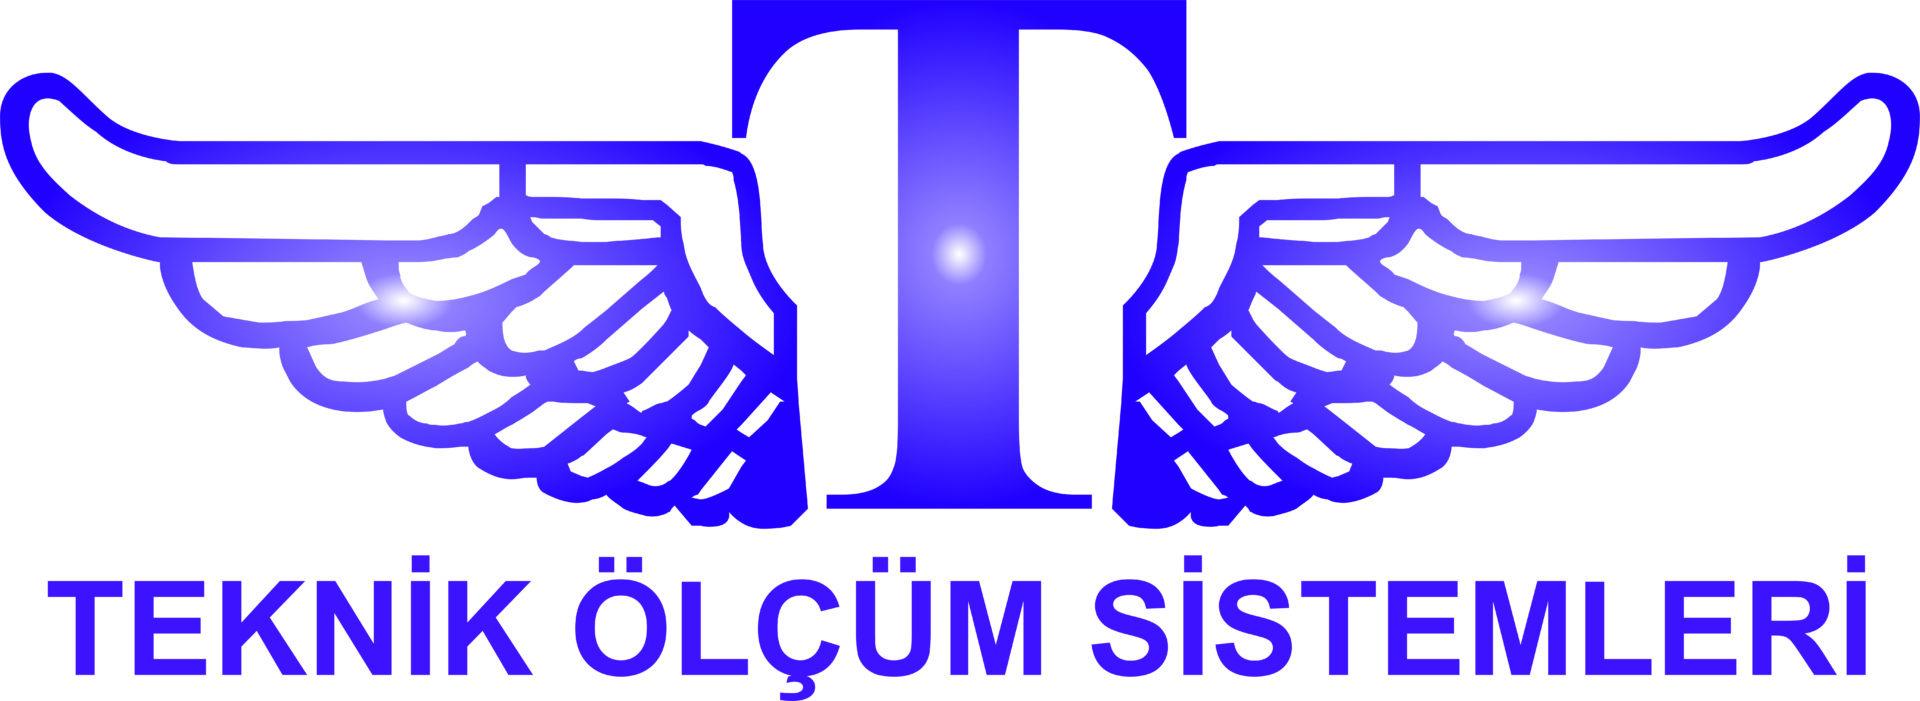 928, 928, Teknik Logo, Teknik-Logo.jpg, 1993672, https://starrett-metrology.co.uk/wp-content/uploads/2020/02/Teknik-Logo.jpg, https://starrett-metrology.co.uk/distributor/teknik-logo/, , 4, , , teknik-logo, inherit, 261, 2020-02-28 14:26:02, 2020-02-28 14:26:02, 0, image/jpeg, image, jpeg, https://starrett-metrology.co.uk/wp-includes/images/media/default.png, 1920, 701, Array